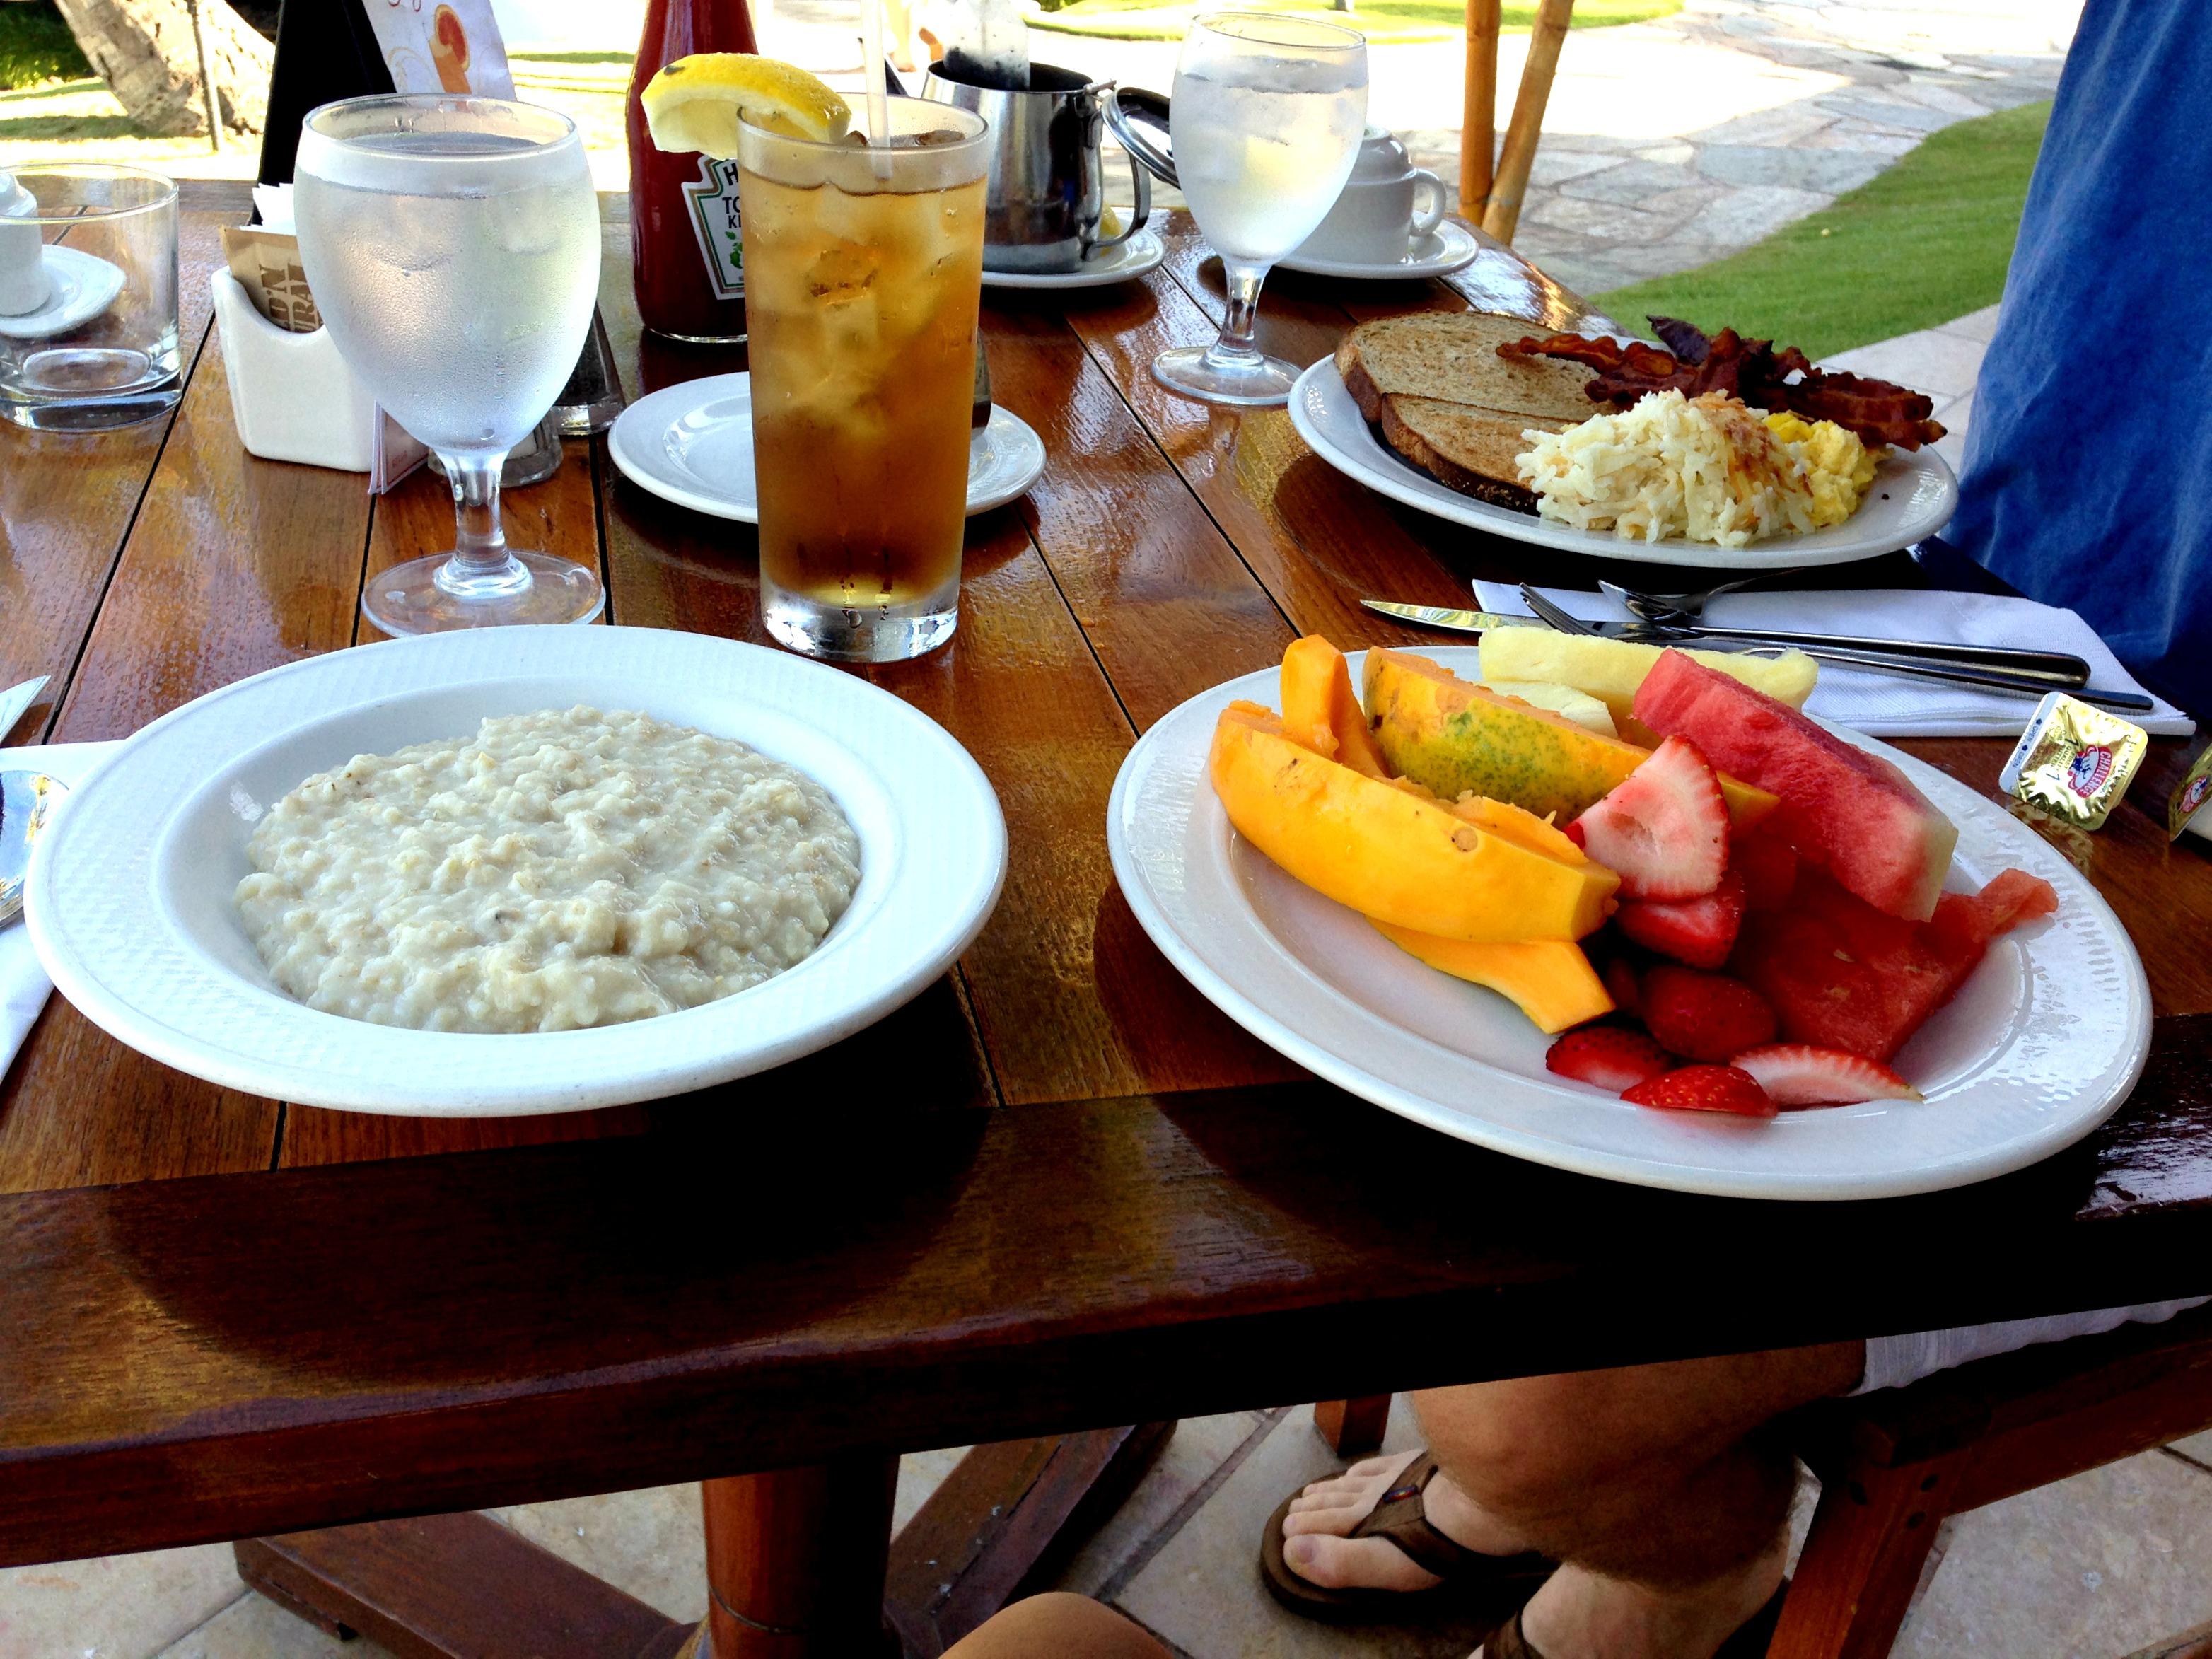 breakfast at the sheraton maui spread